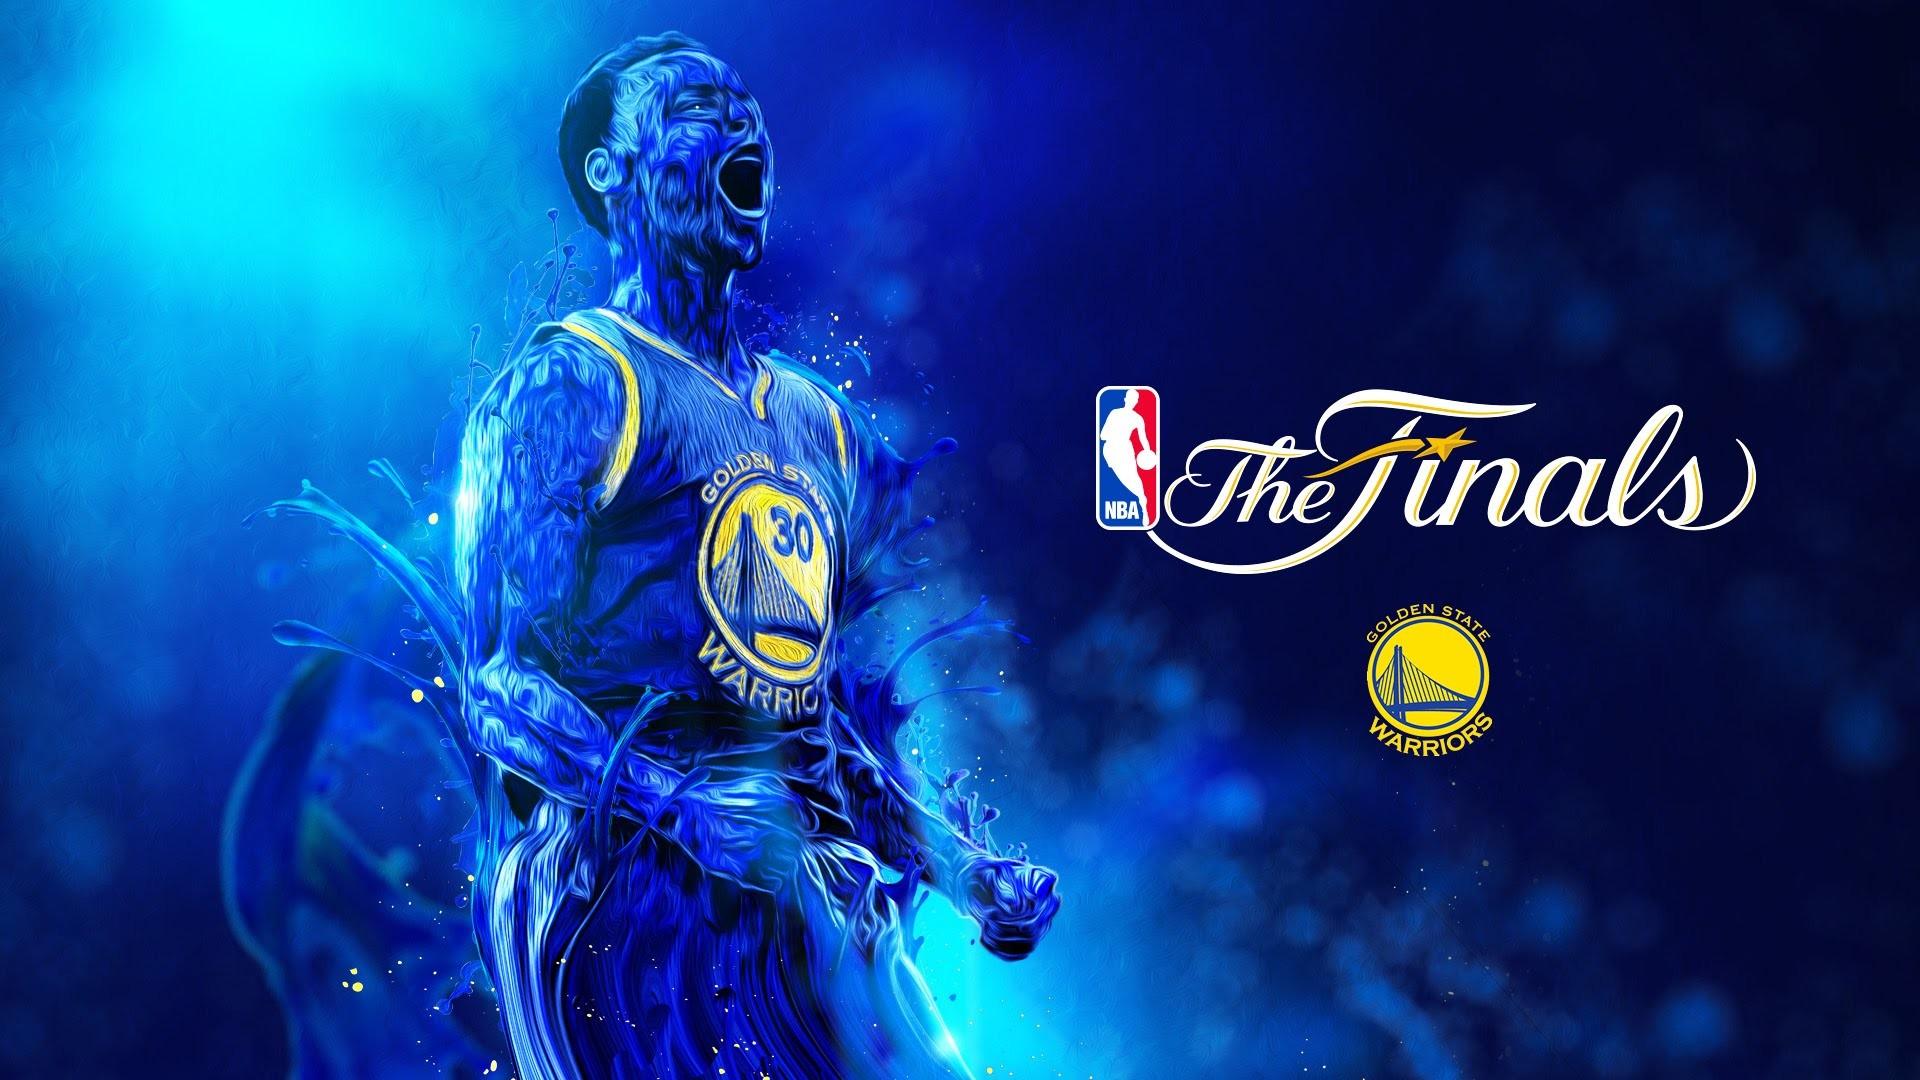 Stephen Curry Golden State Warriors. stephen_curry_photos.  stephen_curry_photos